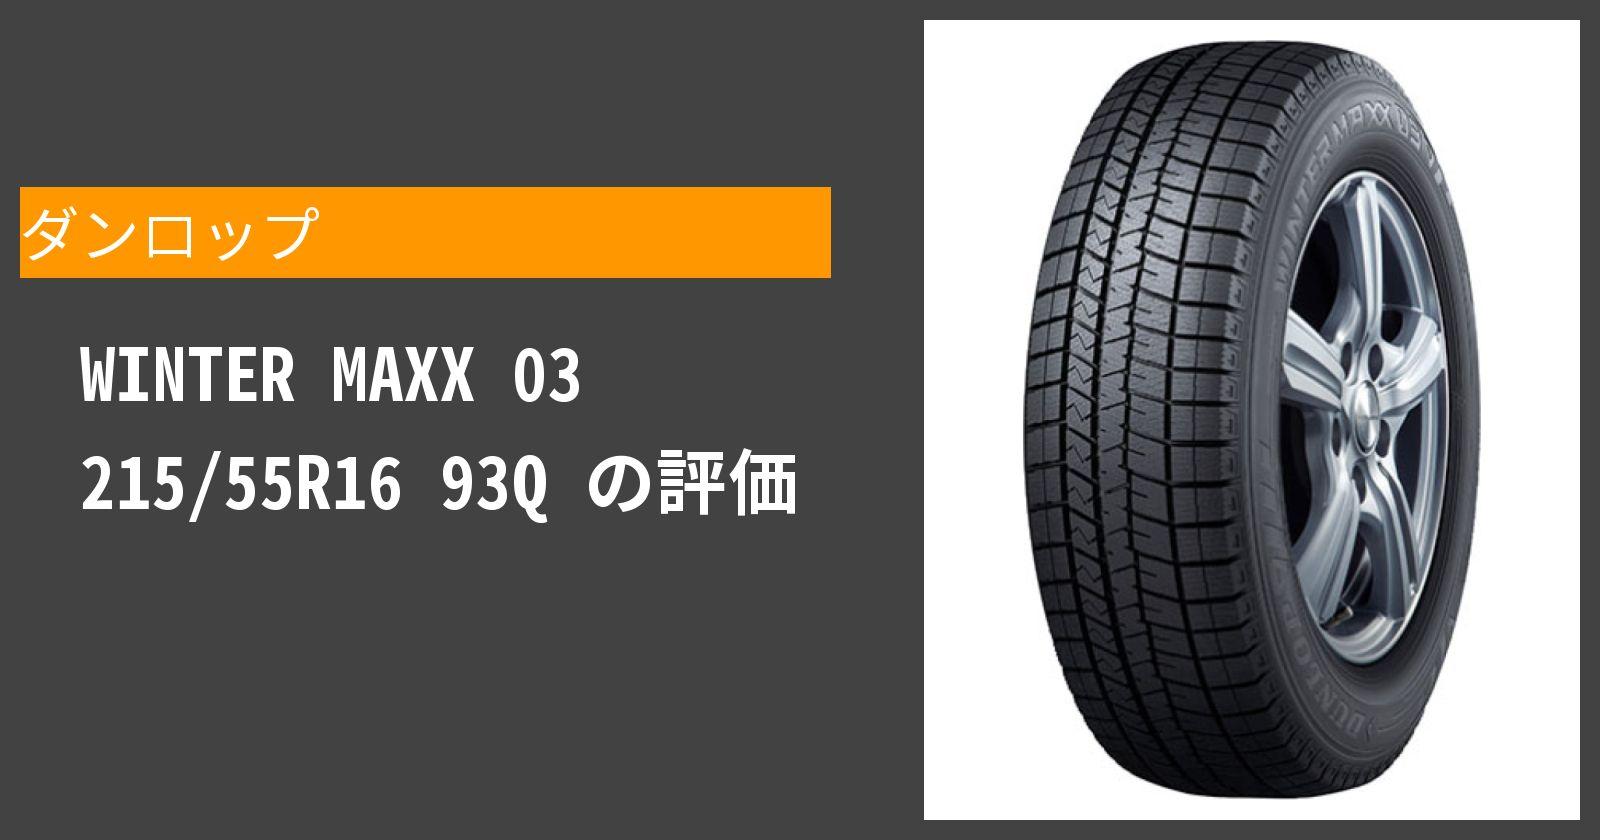 WINTER MAXX 03 215/55R16 93Qを徹底評価